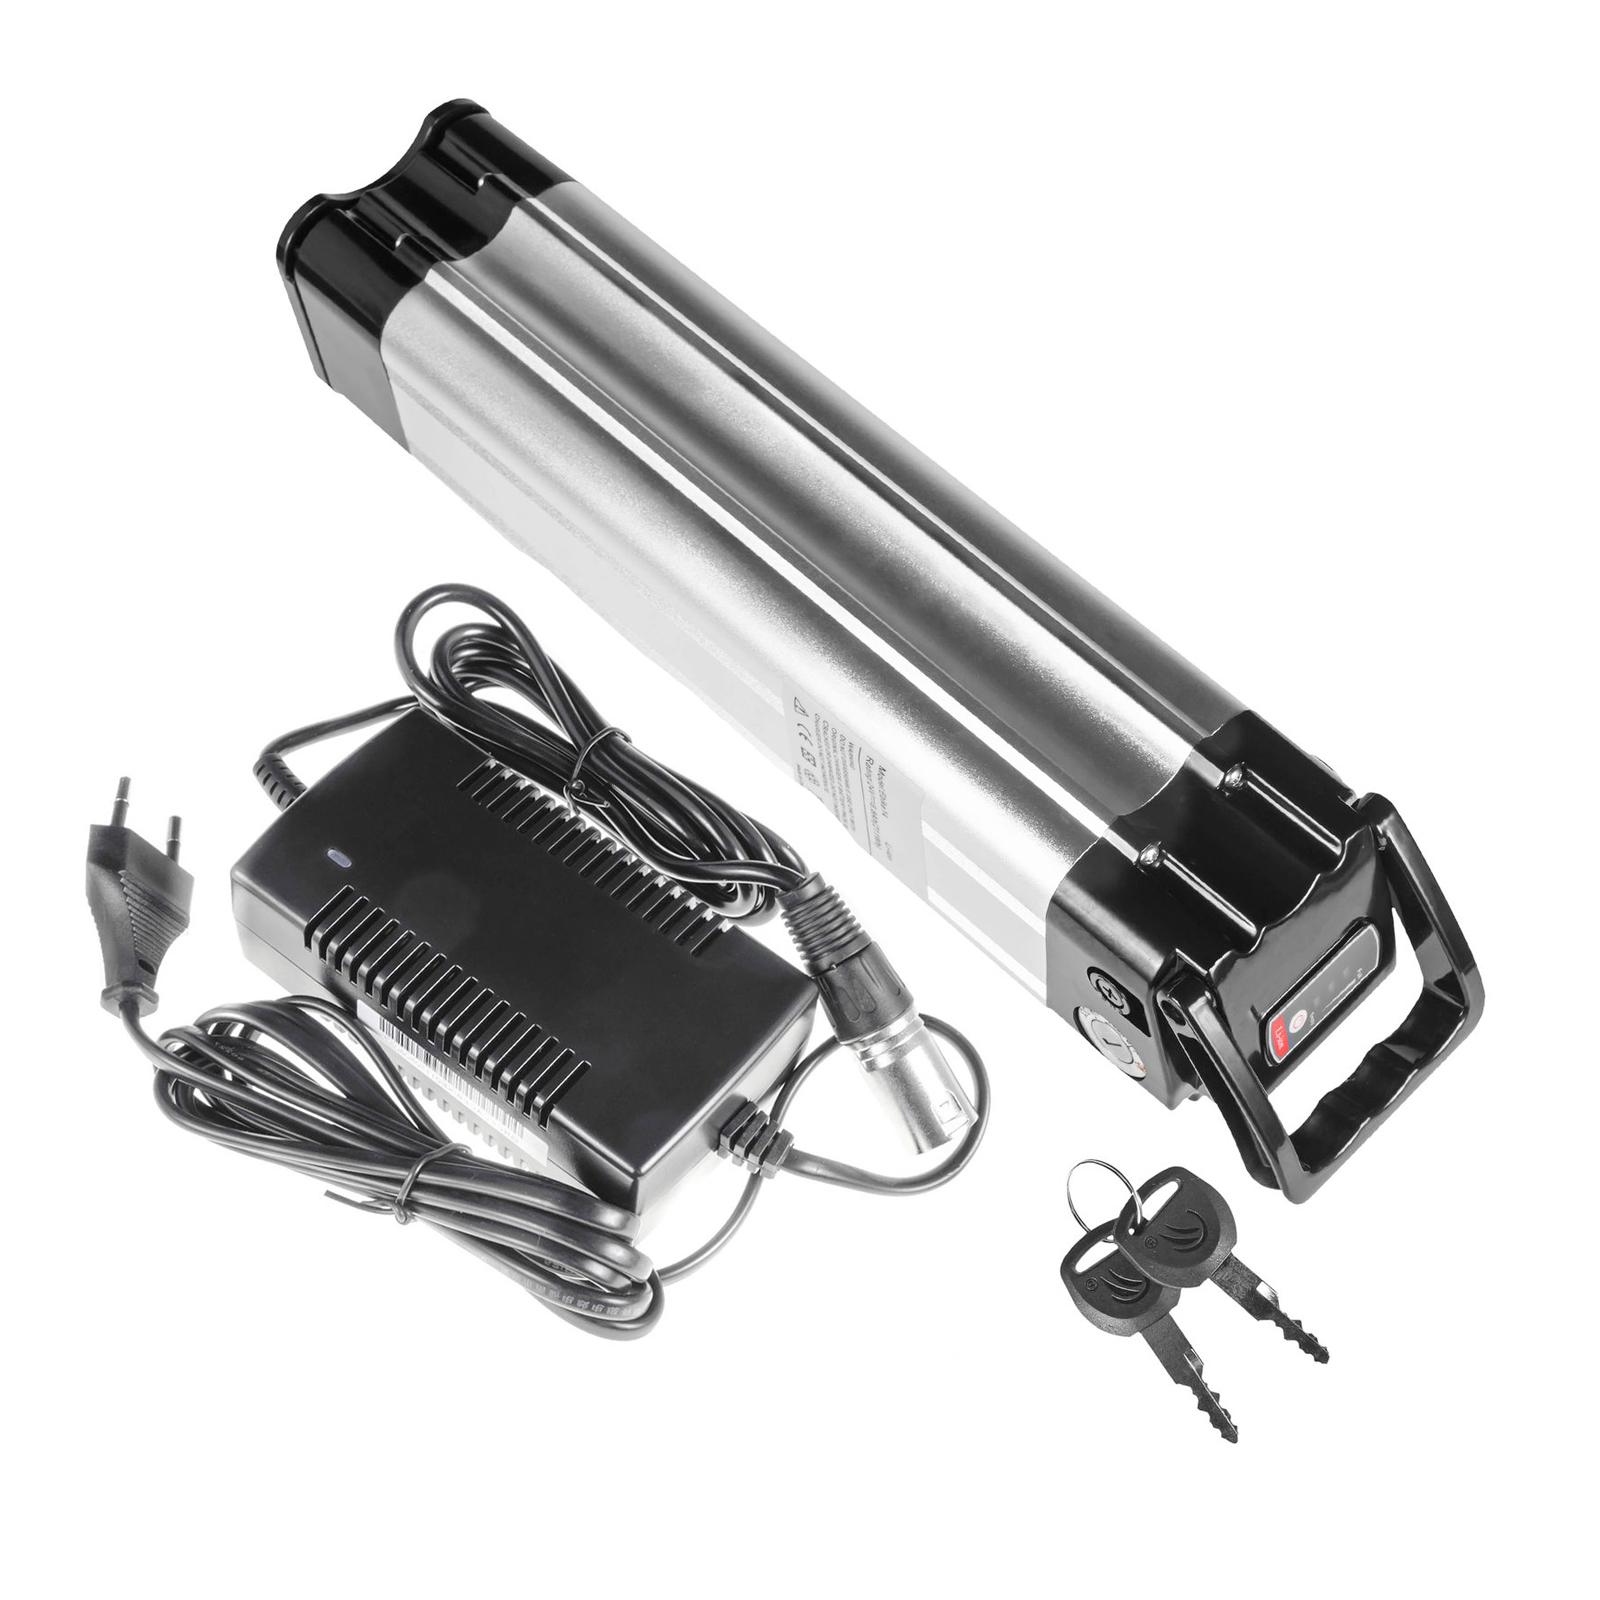 Rechargeable Lithium ion Ebike Battery 36v 10ah electric bike li ion battery xh370-10j